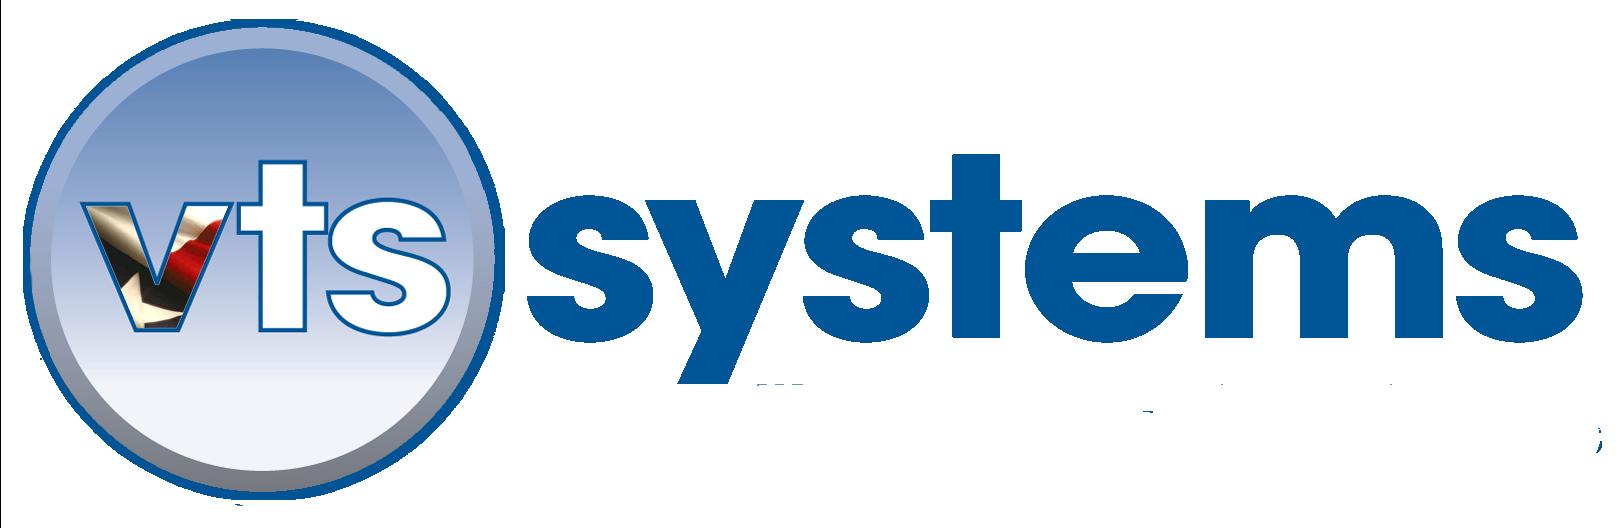 MASTR VTS_logo_Blue_letters (2017_12_20 17_58_18 UTC)-1